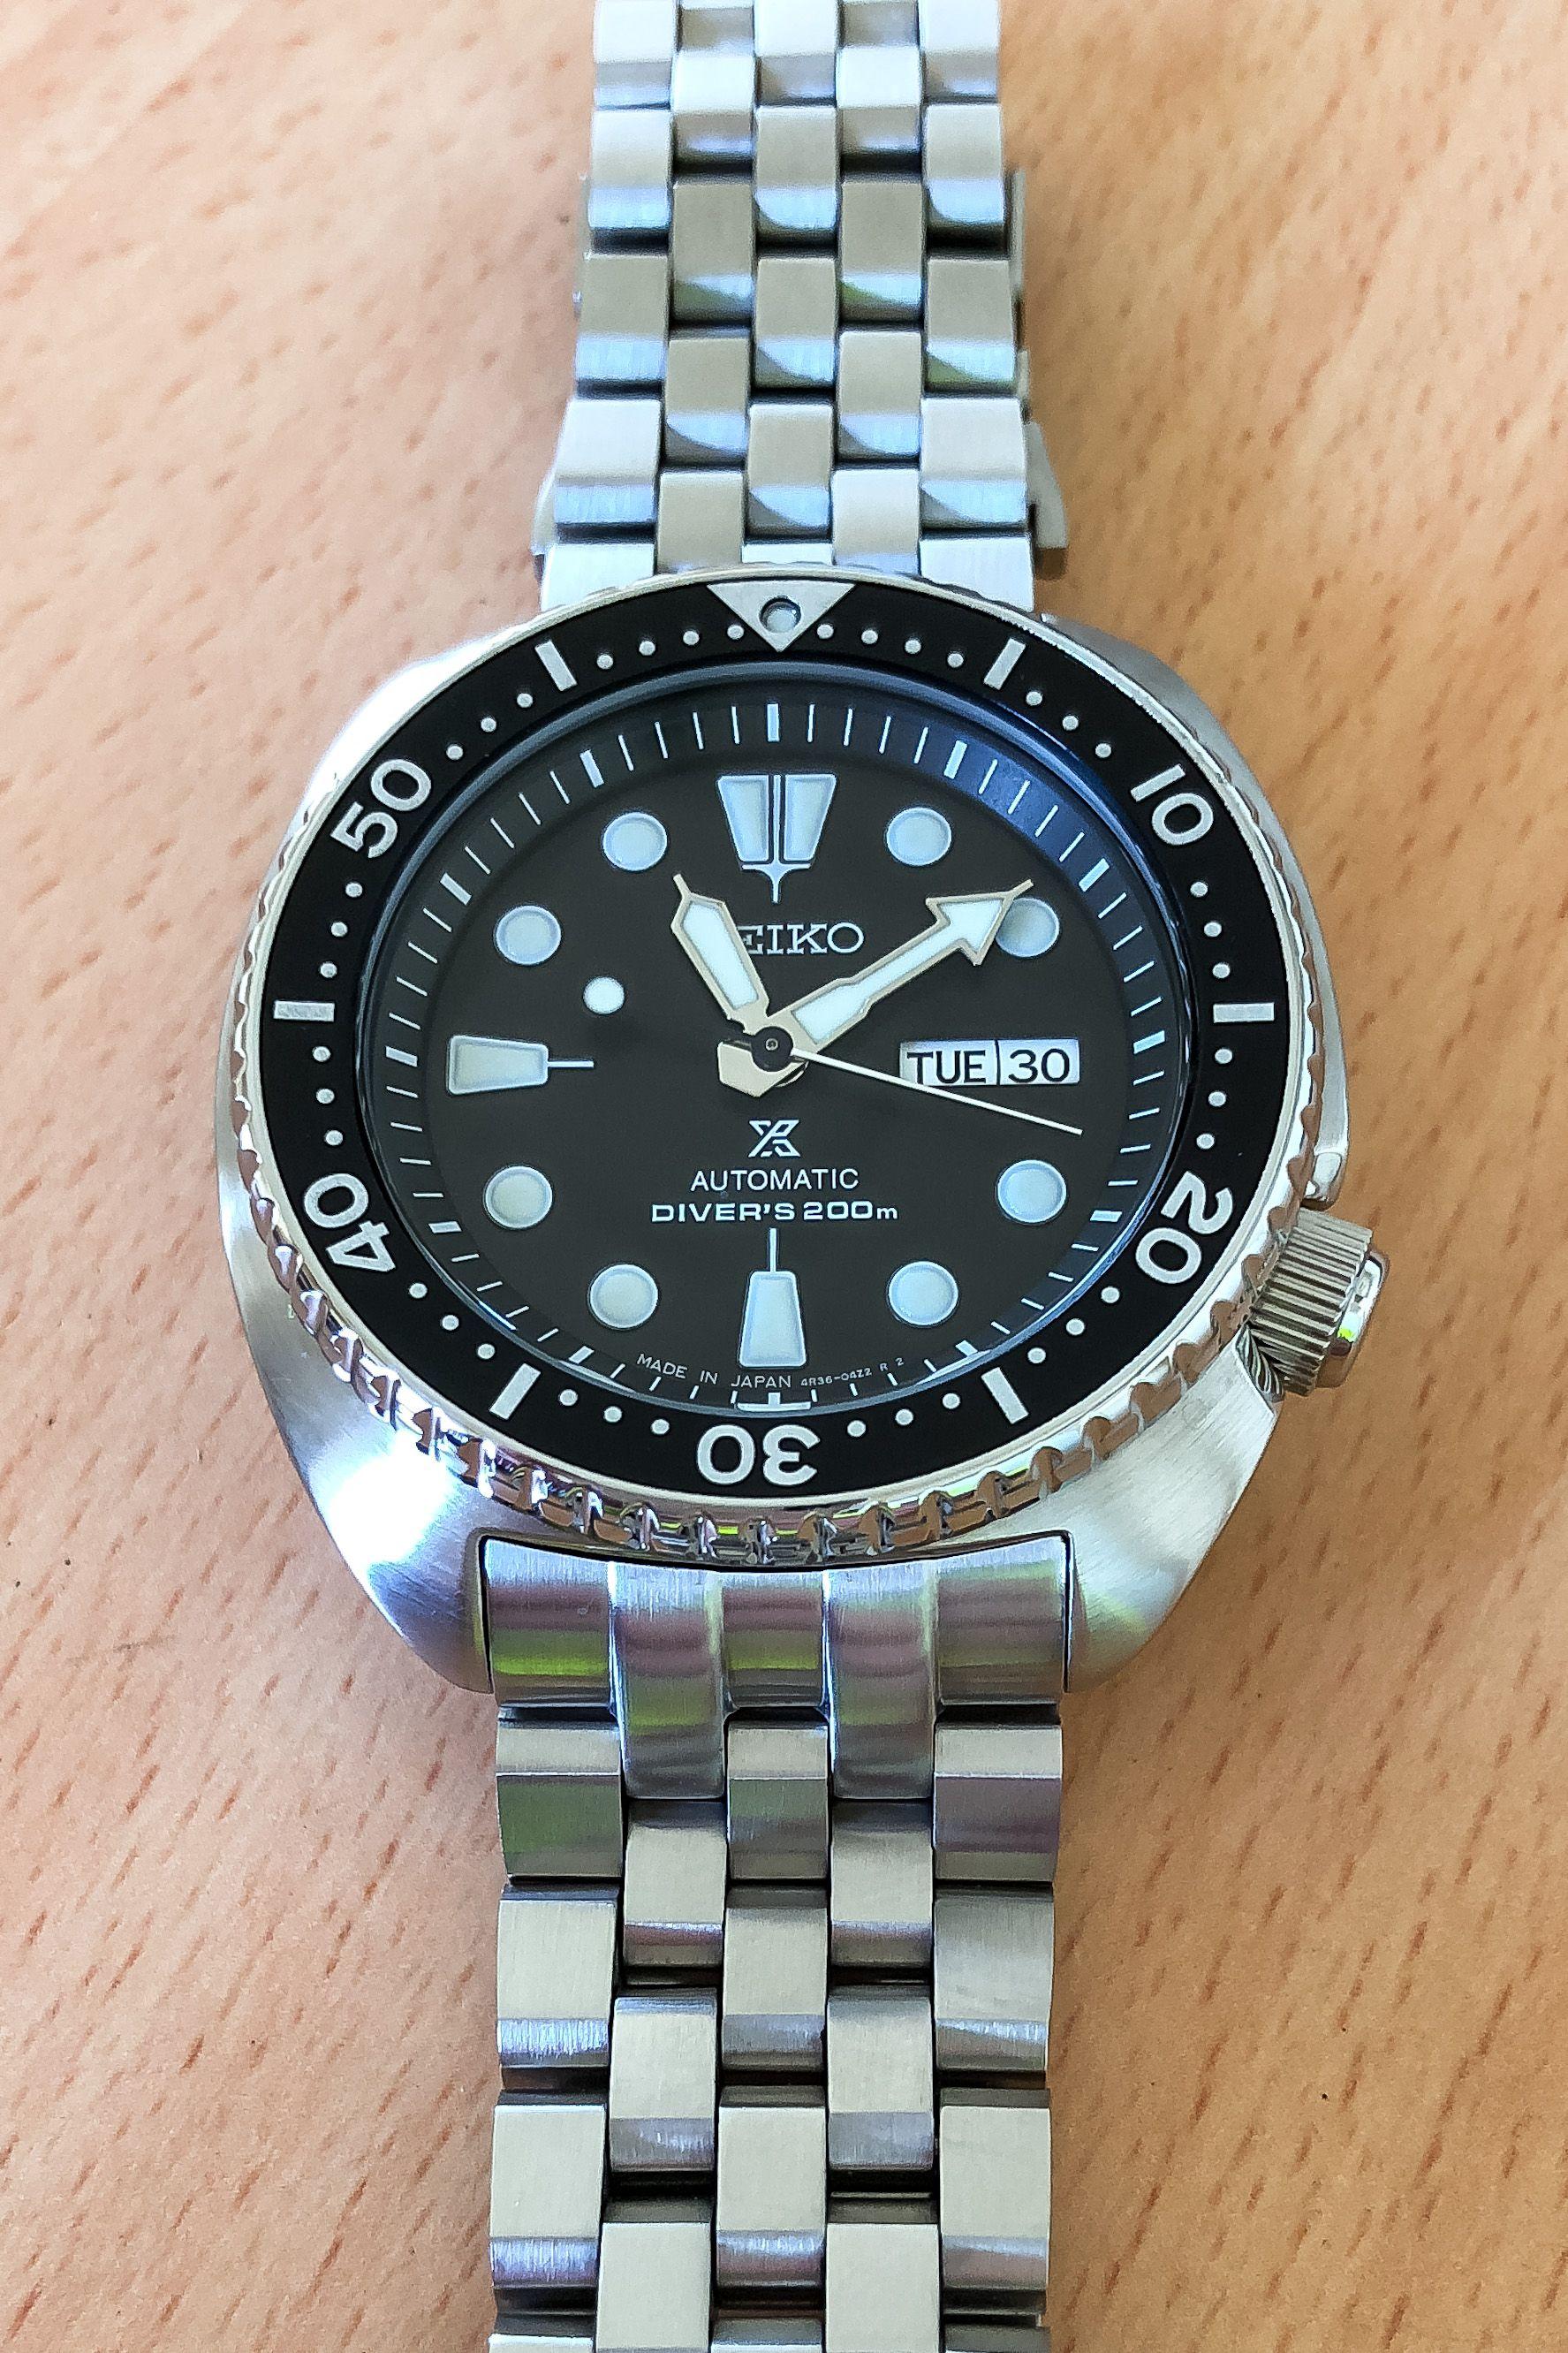 21e71a514e0a0 Seiko SRP777 Turtle on Strapcode Super Engineer bracelet Seiko Watches